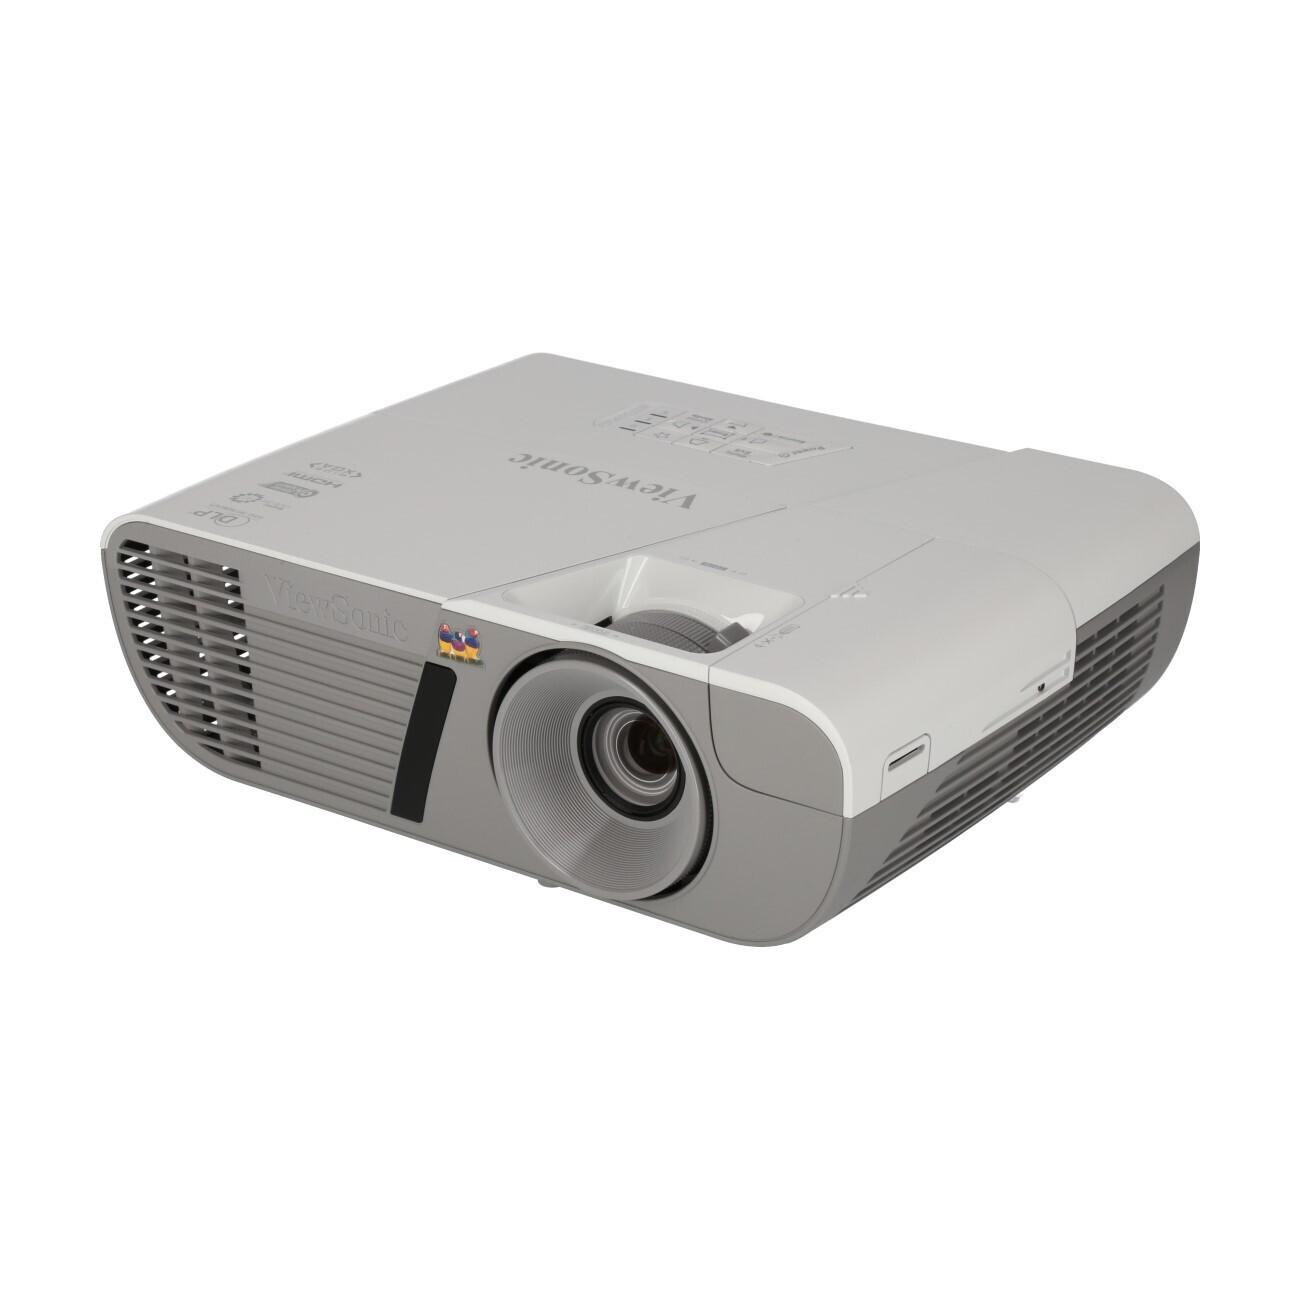 Viewsonic PJD6552LW Business Beamer mit 3500 ANSI-Lumen und WXGA